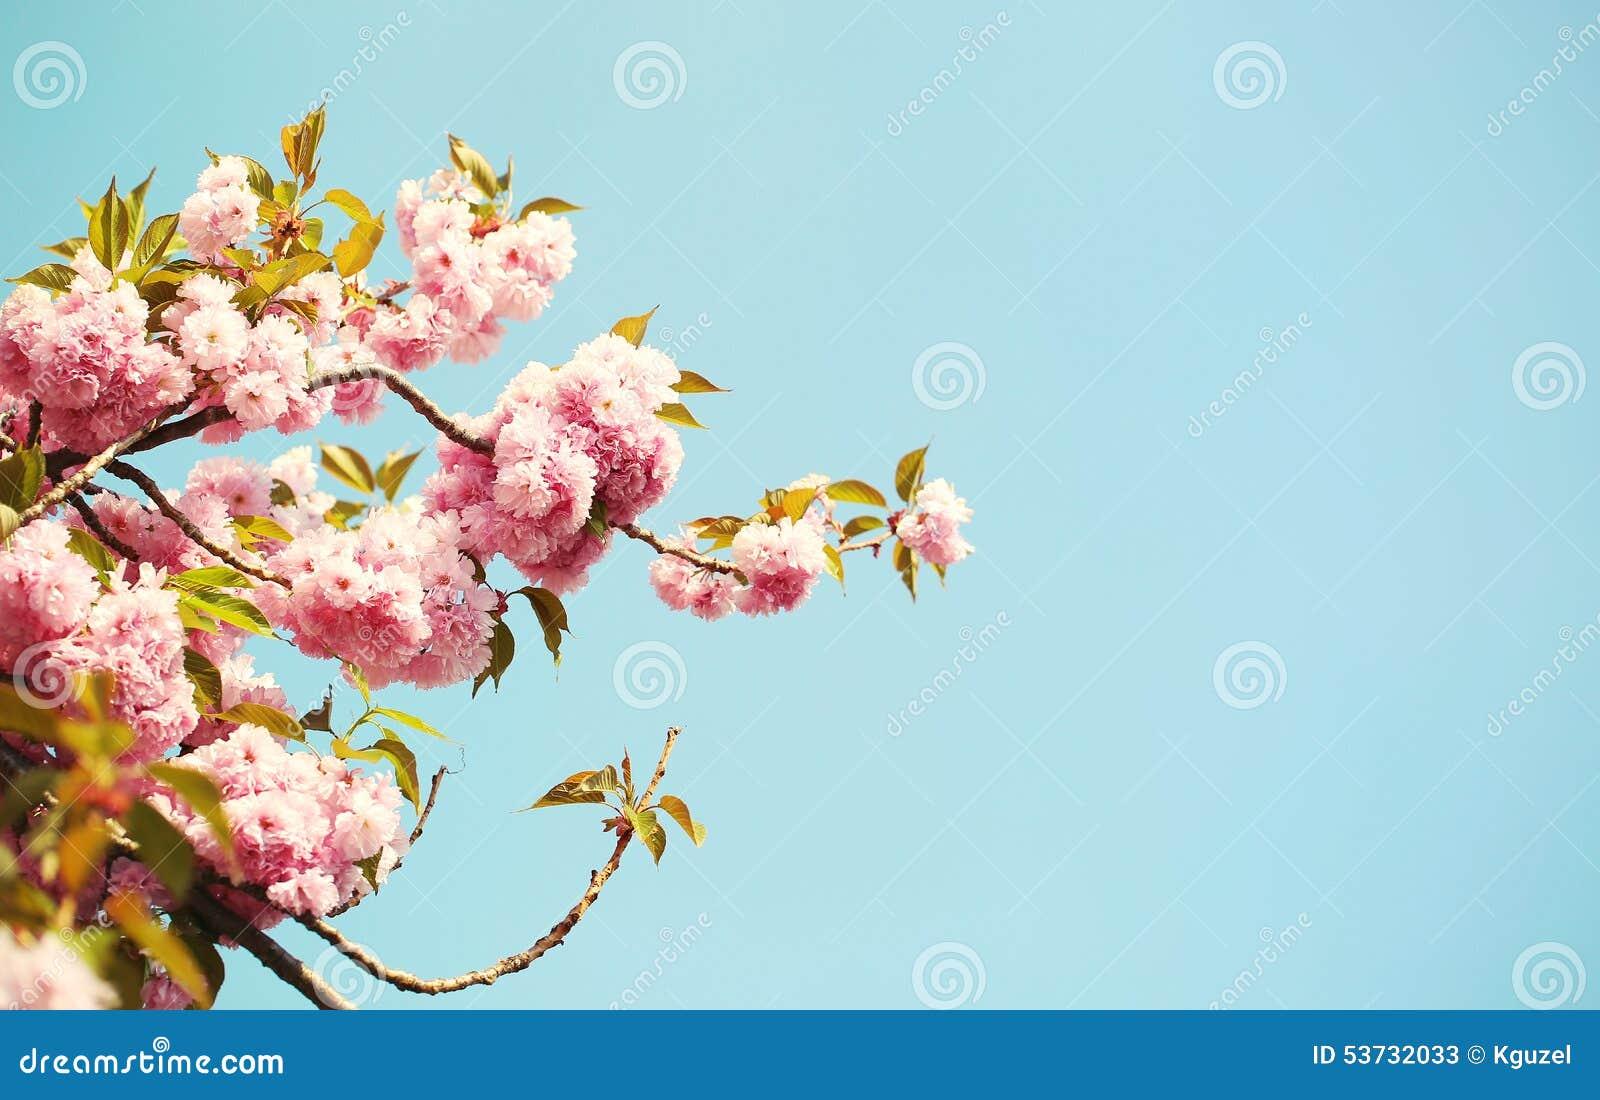 cherry blossom im fr hjahr sch ne rosa blumen stockfoto bild 53732033. Black Bedroom Furniture Sets. Home Design Ideas